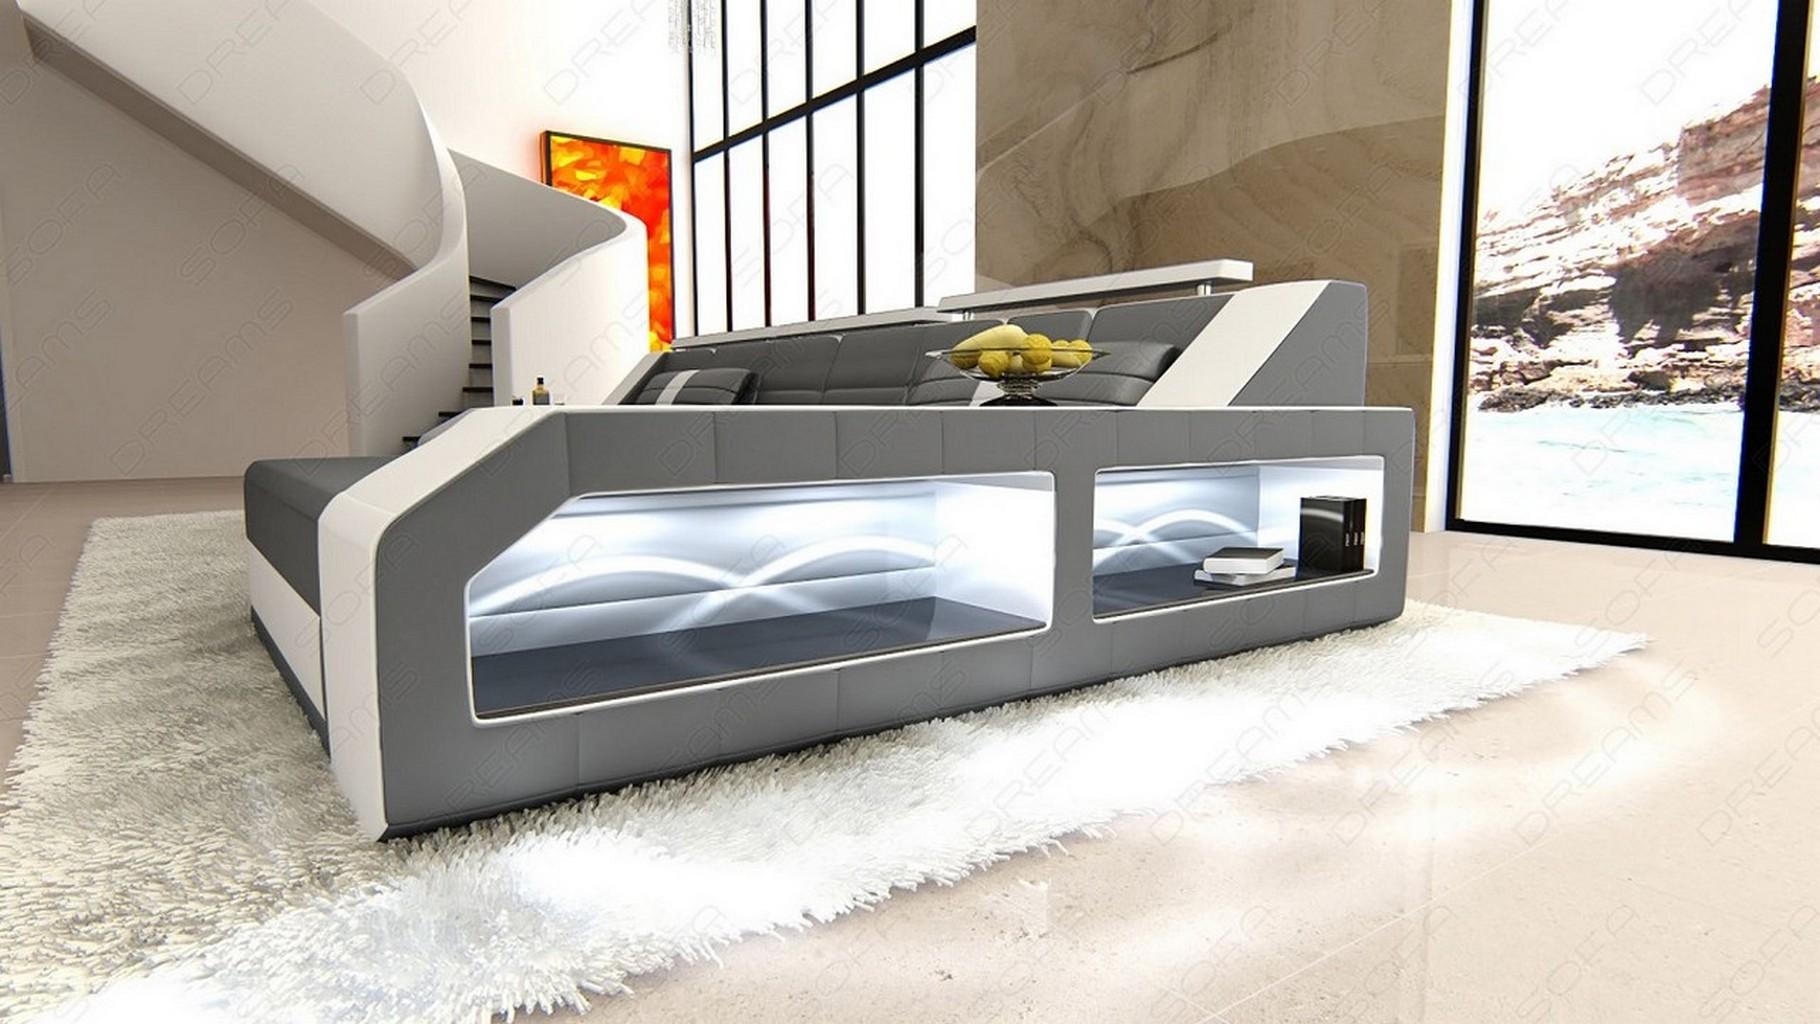 ledersofa eckcouch sofa leder arezzo l form ecksofa. Black Bedroom Furniture Sets. Home Design Ideas